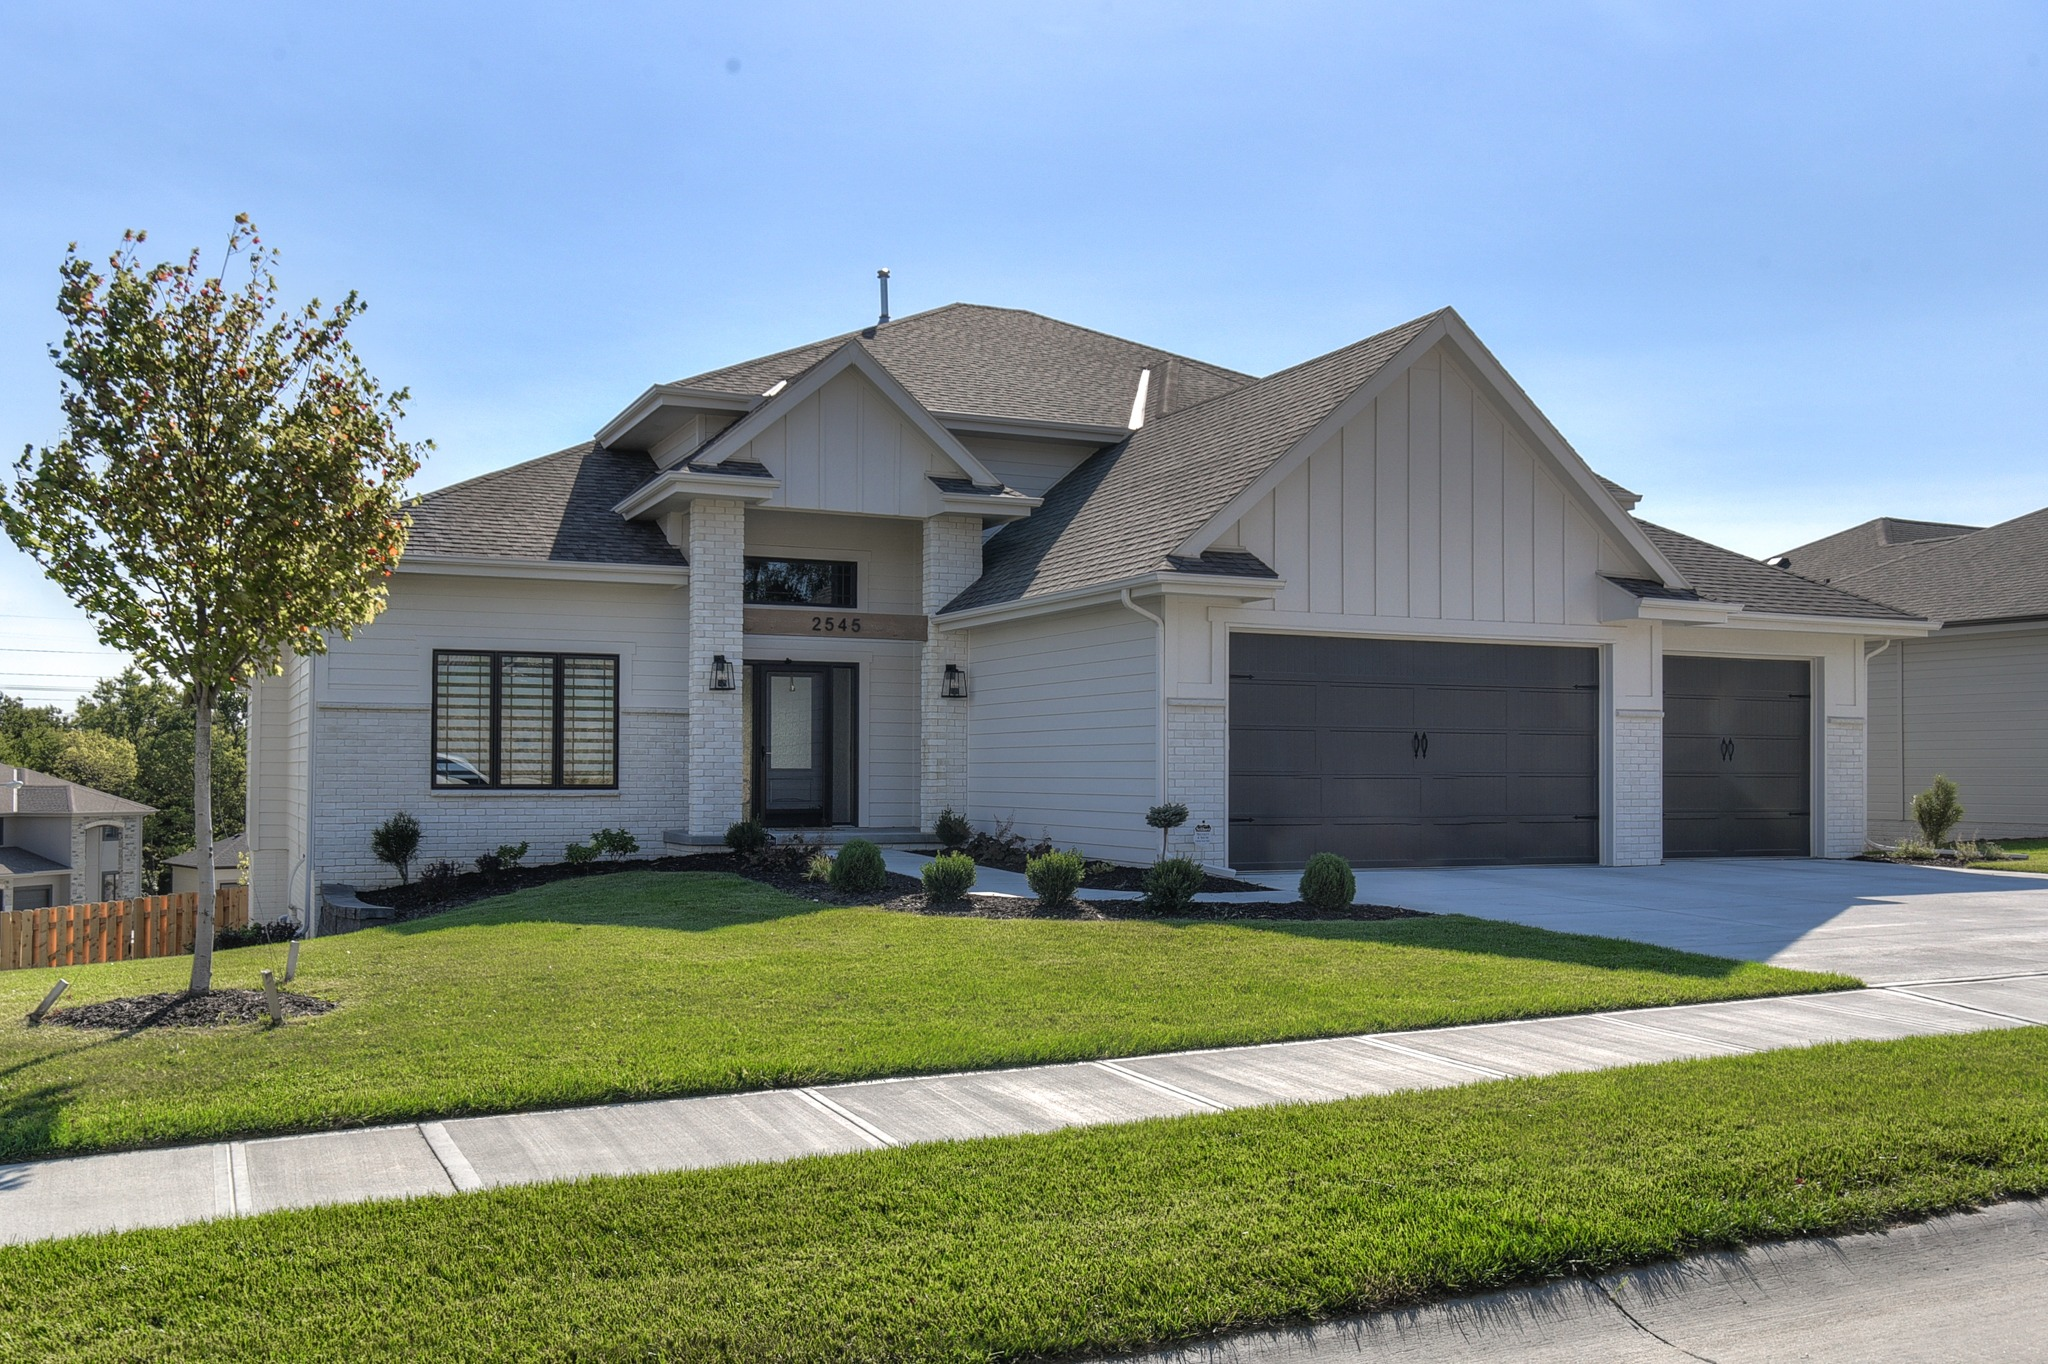 Quality homes in Omaha, Nebraska